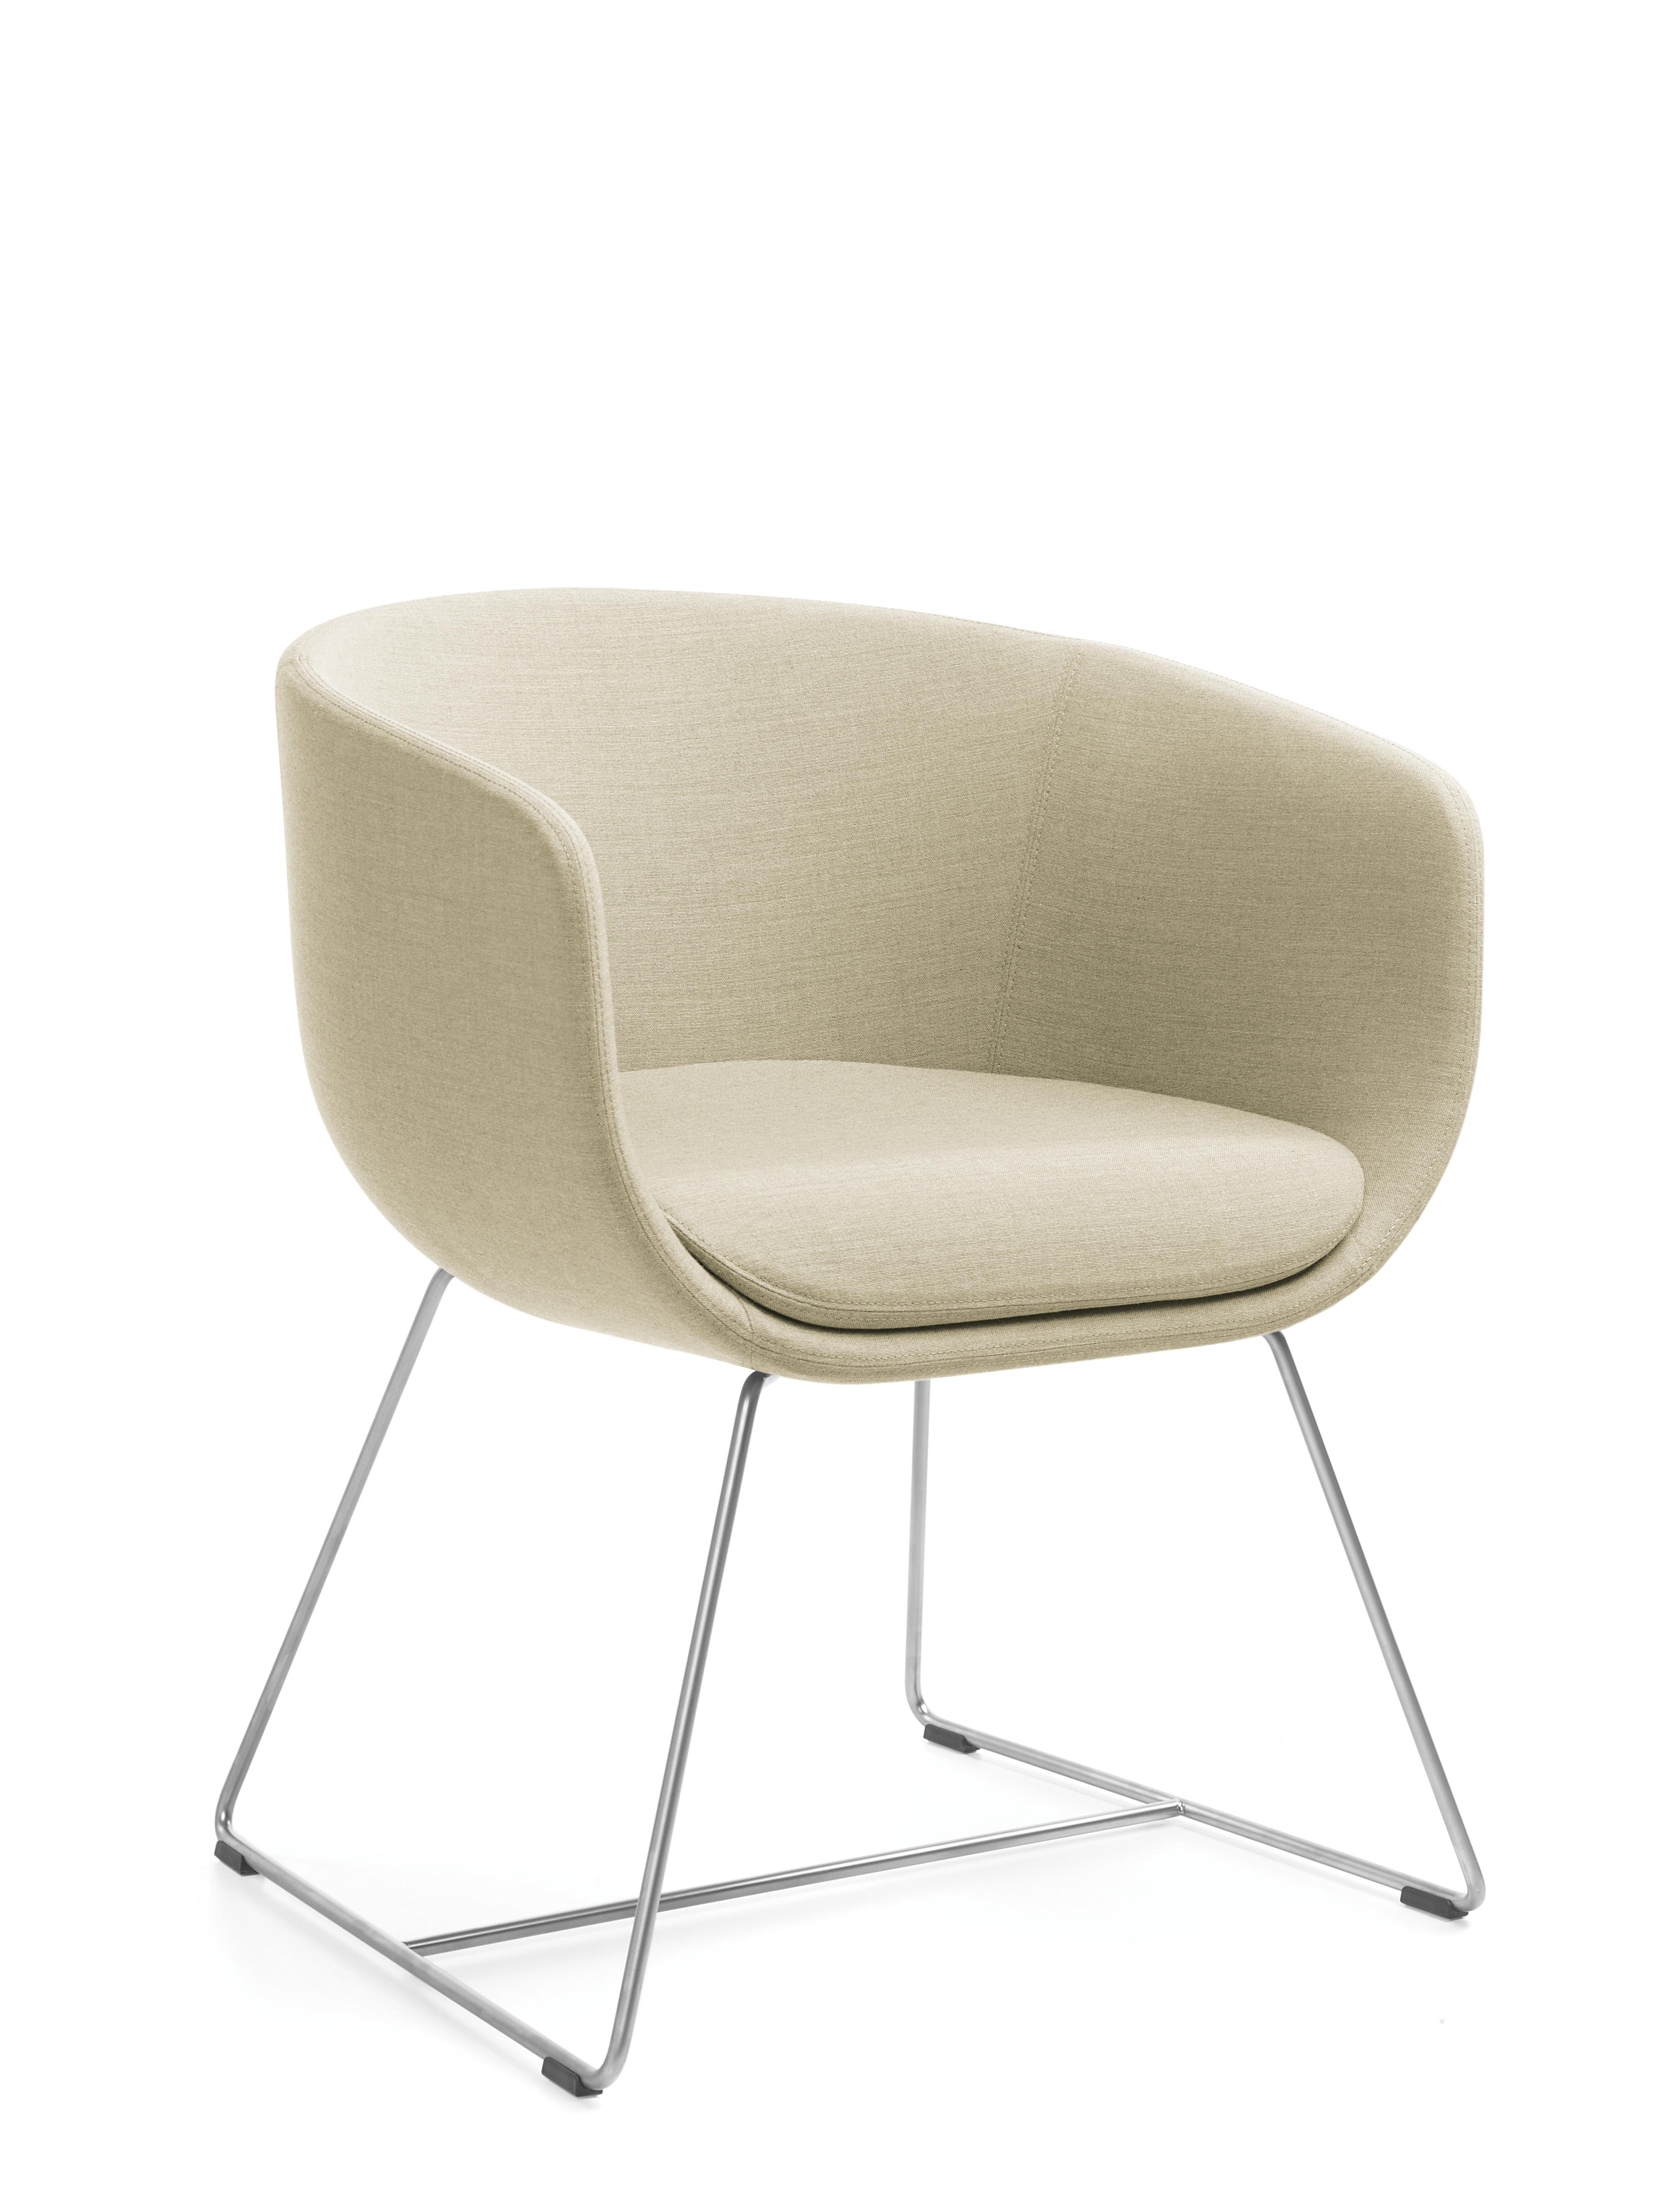 Nu krzesło biurowe Pokker Office (3)